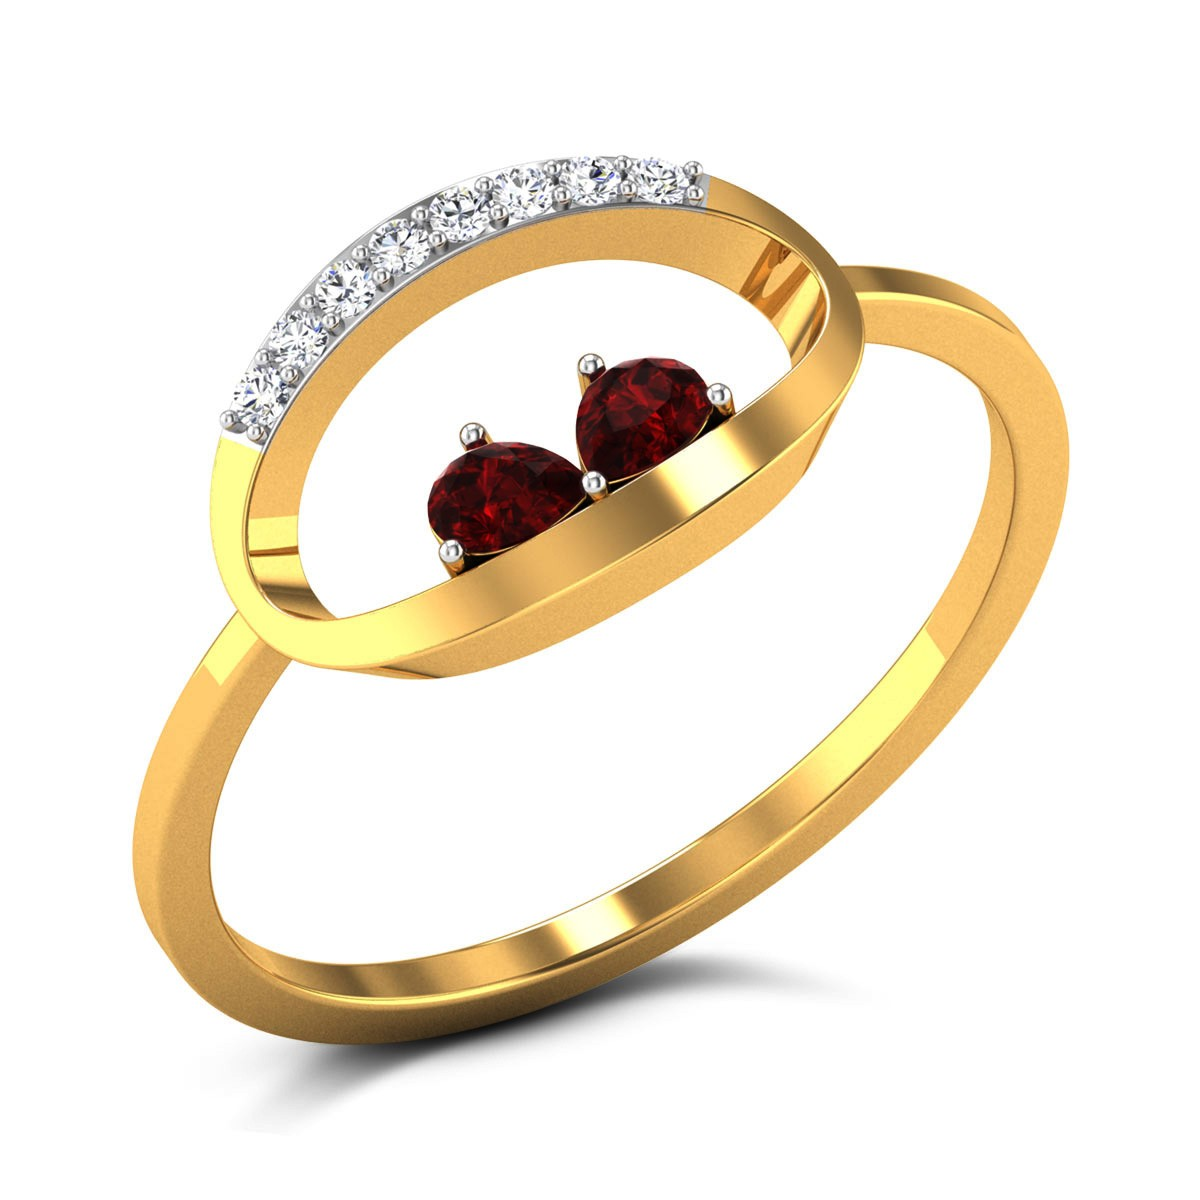 Buy Petula Diamond Ring in 1.91 Grams Gold Online